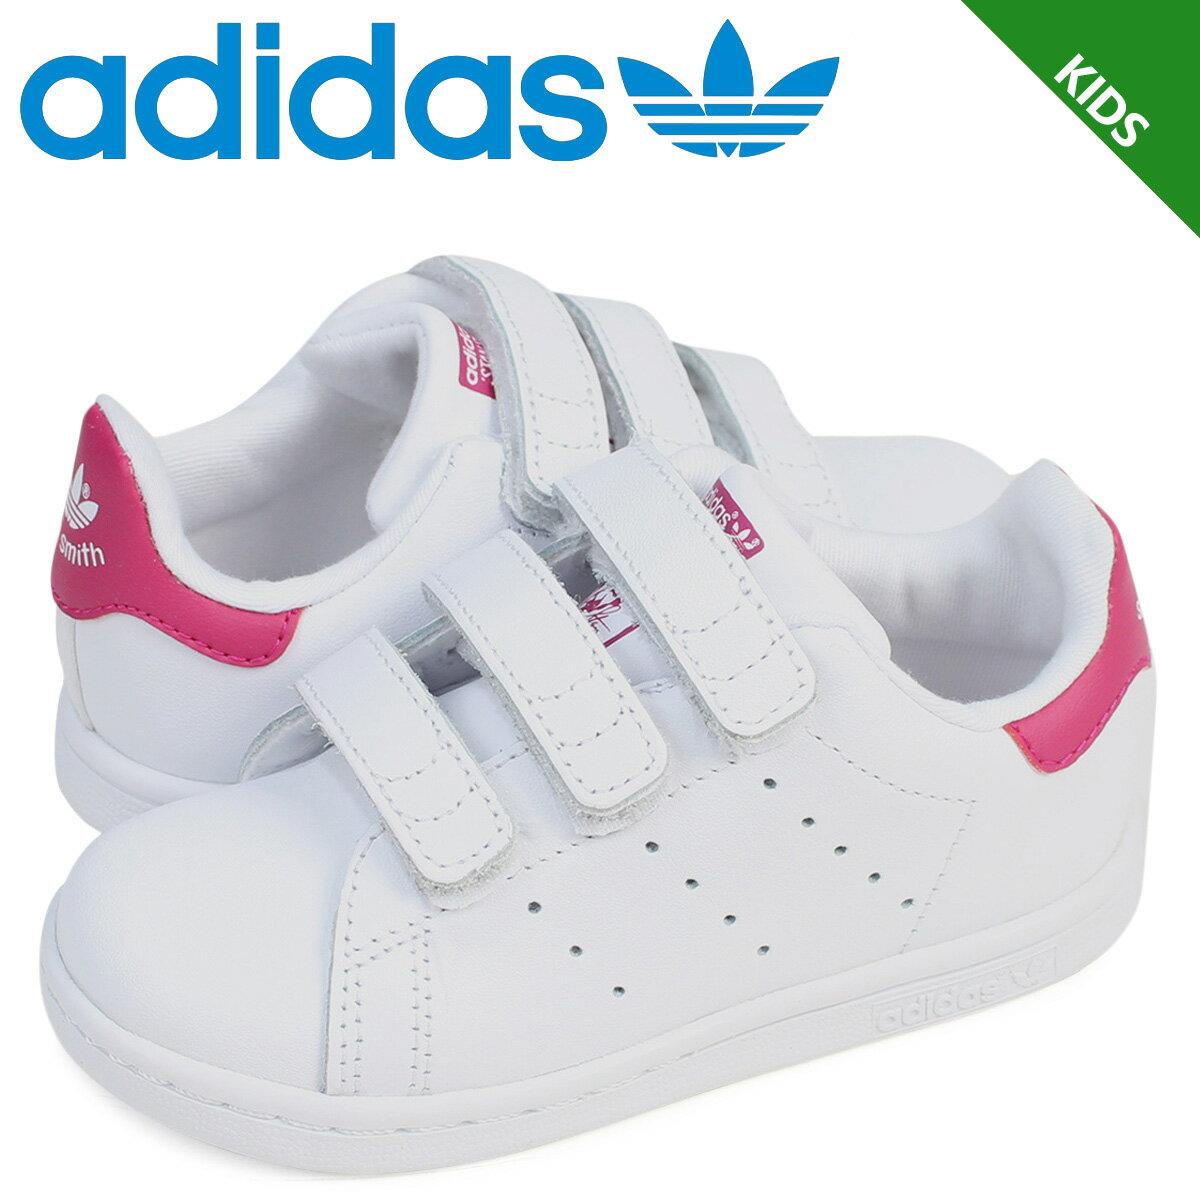 adidas Originals スタンスミス ベルクロ キッズ ベビー アディダス スニーカー STAN SMITH CF I BZ0523 靴 ホワイト ピンク [予約商品 3/2頃入荷予定 追加入荷]